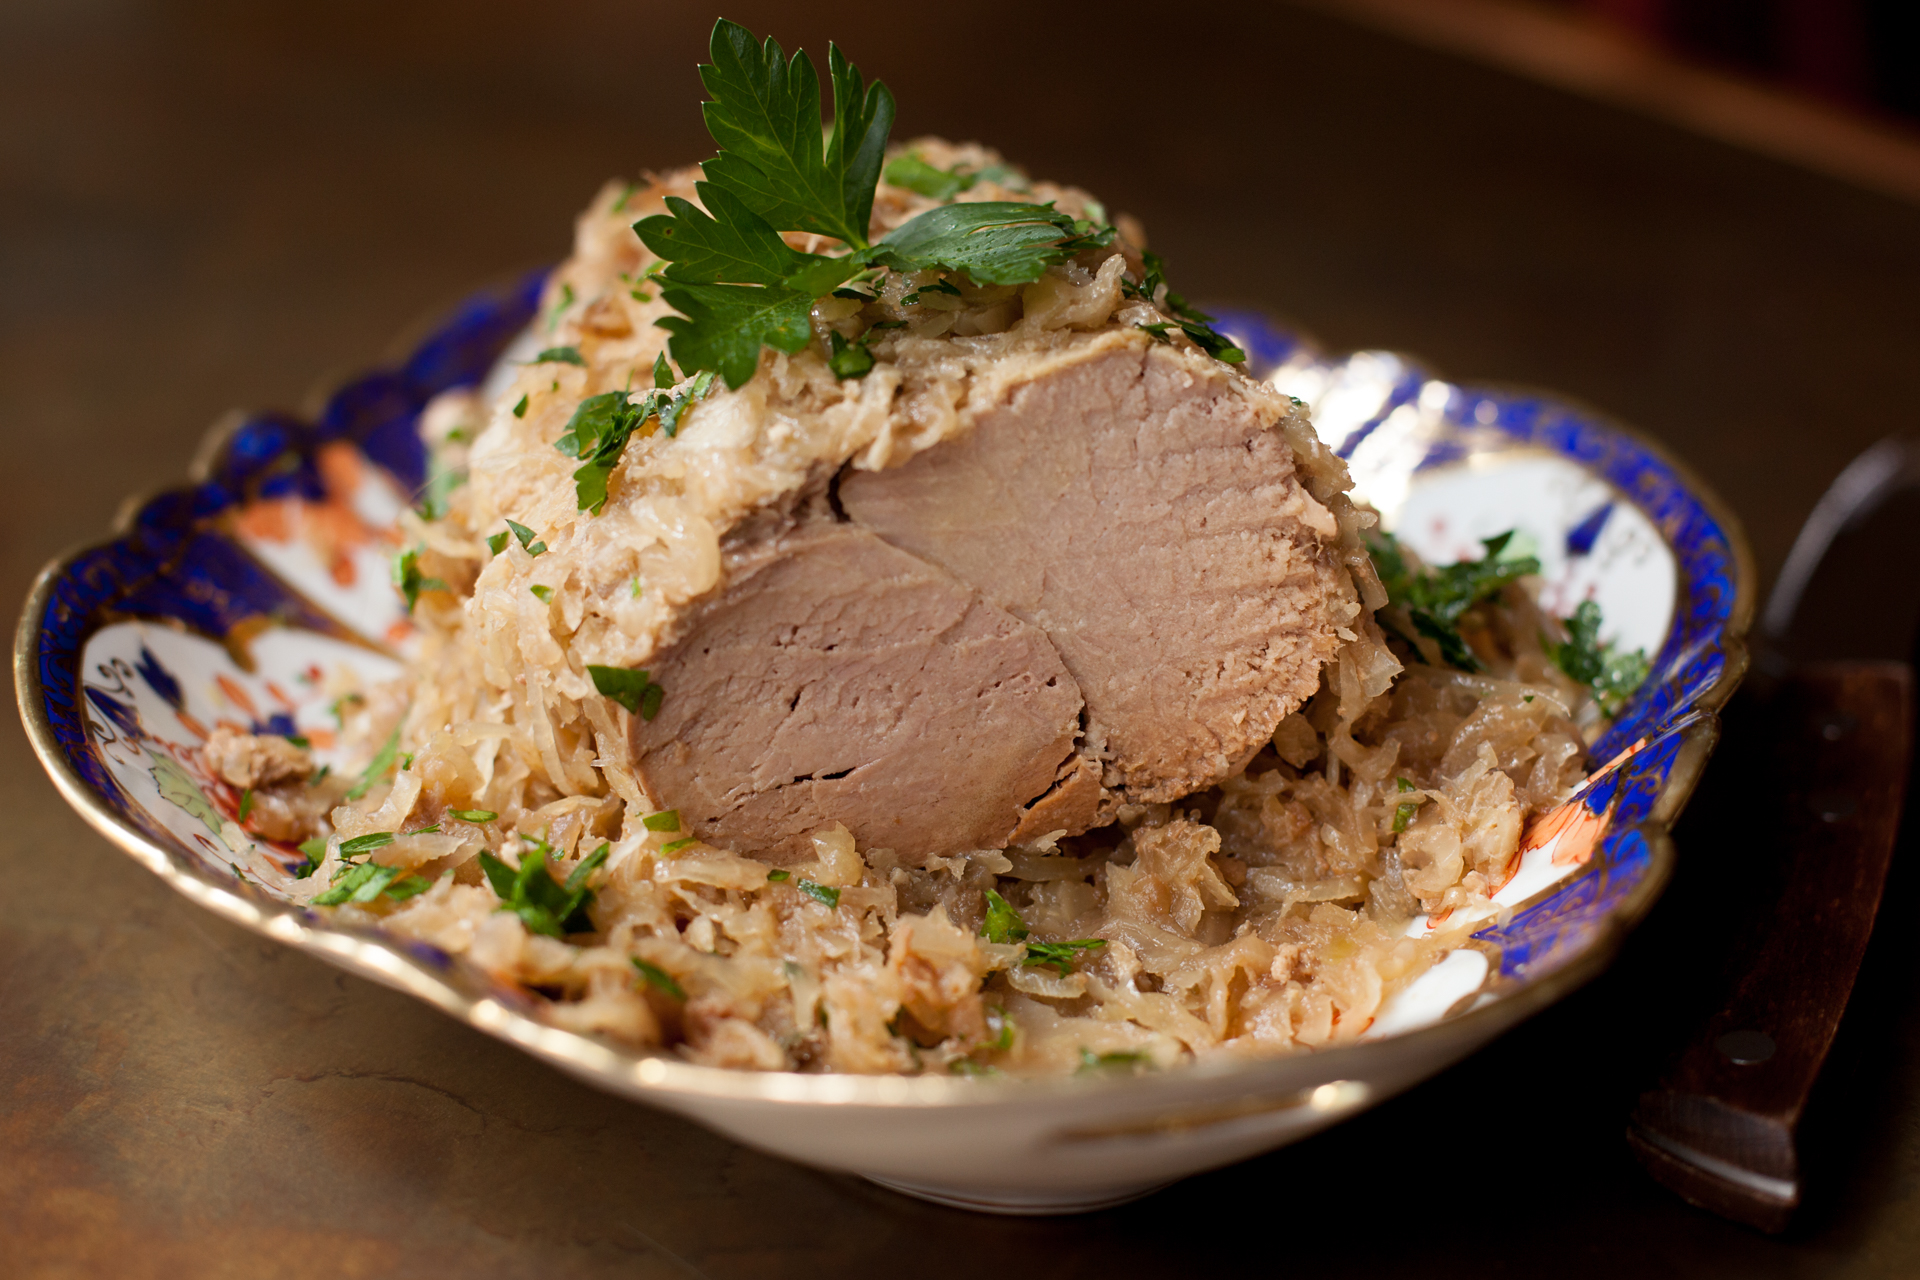 Crock Pot Pork Roast and Sauerkraut Recipe